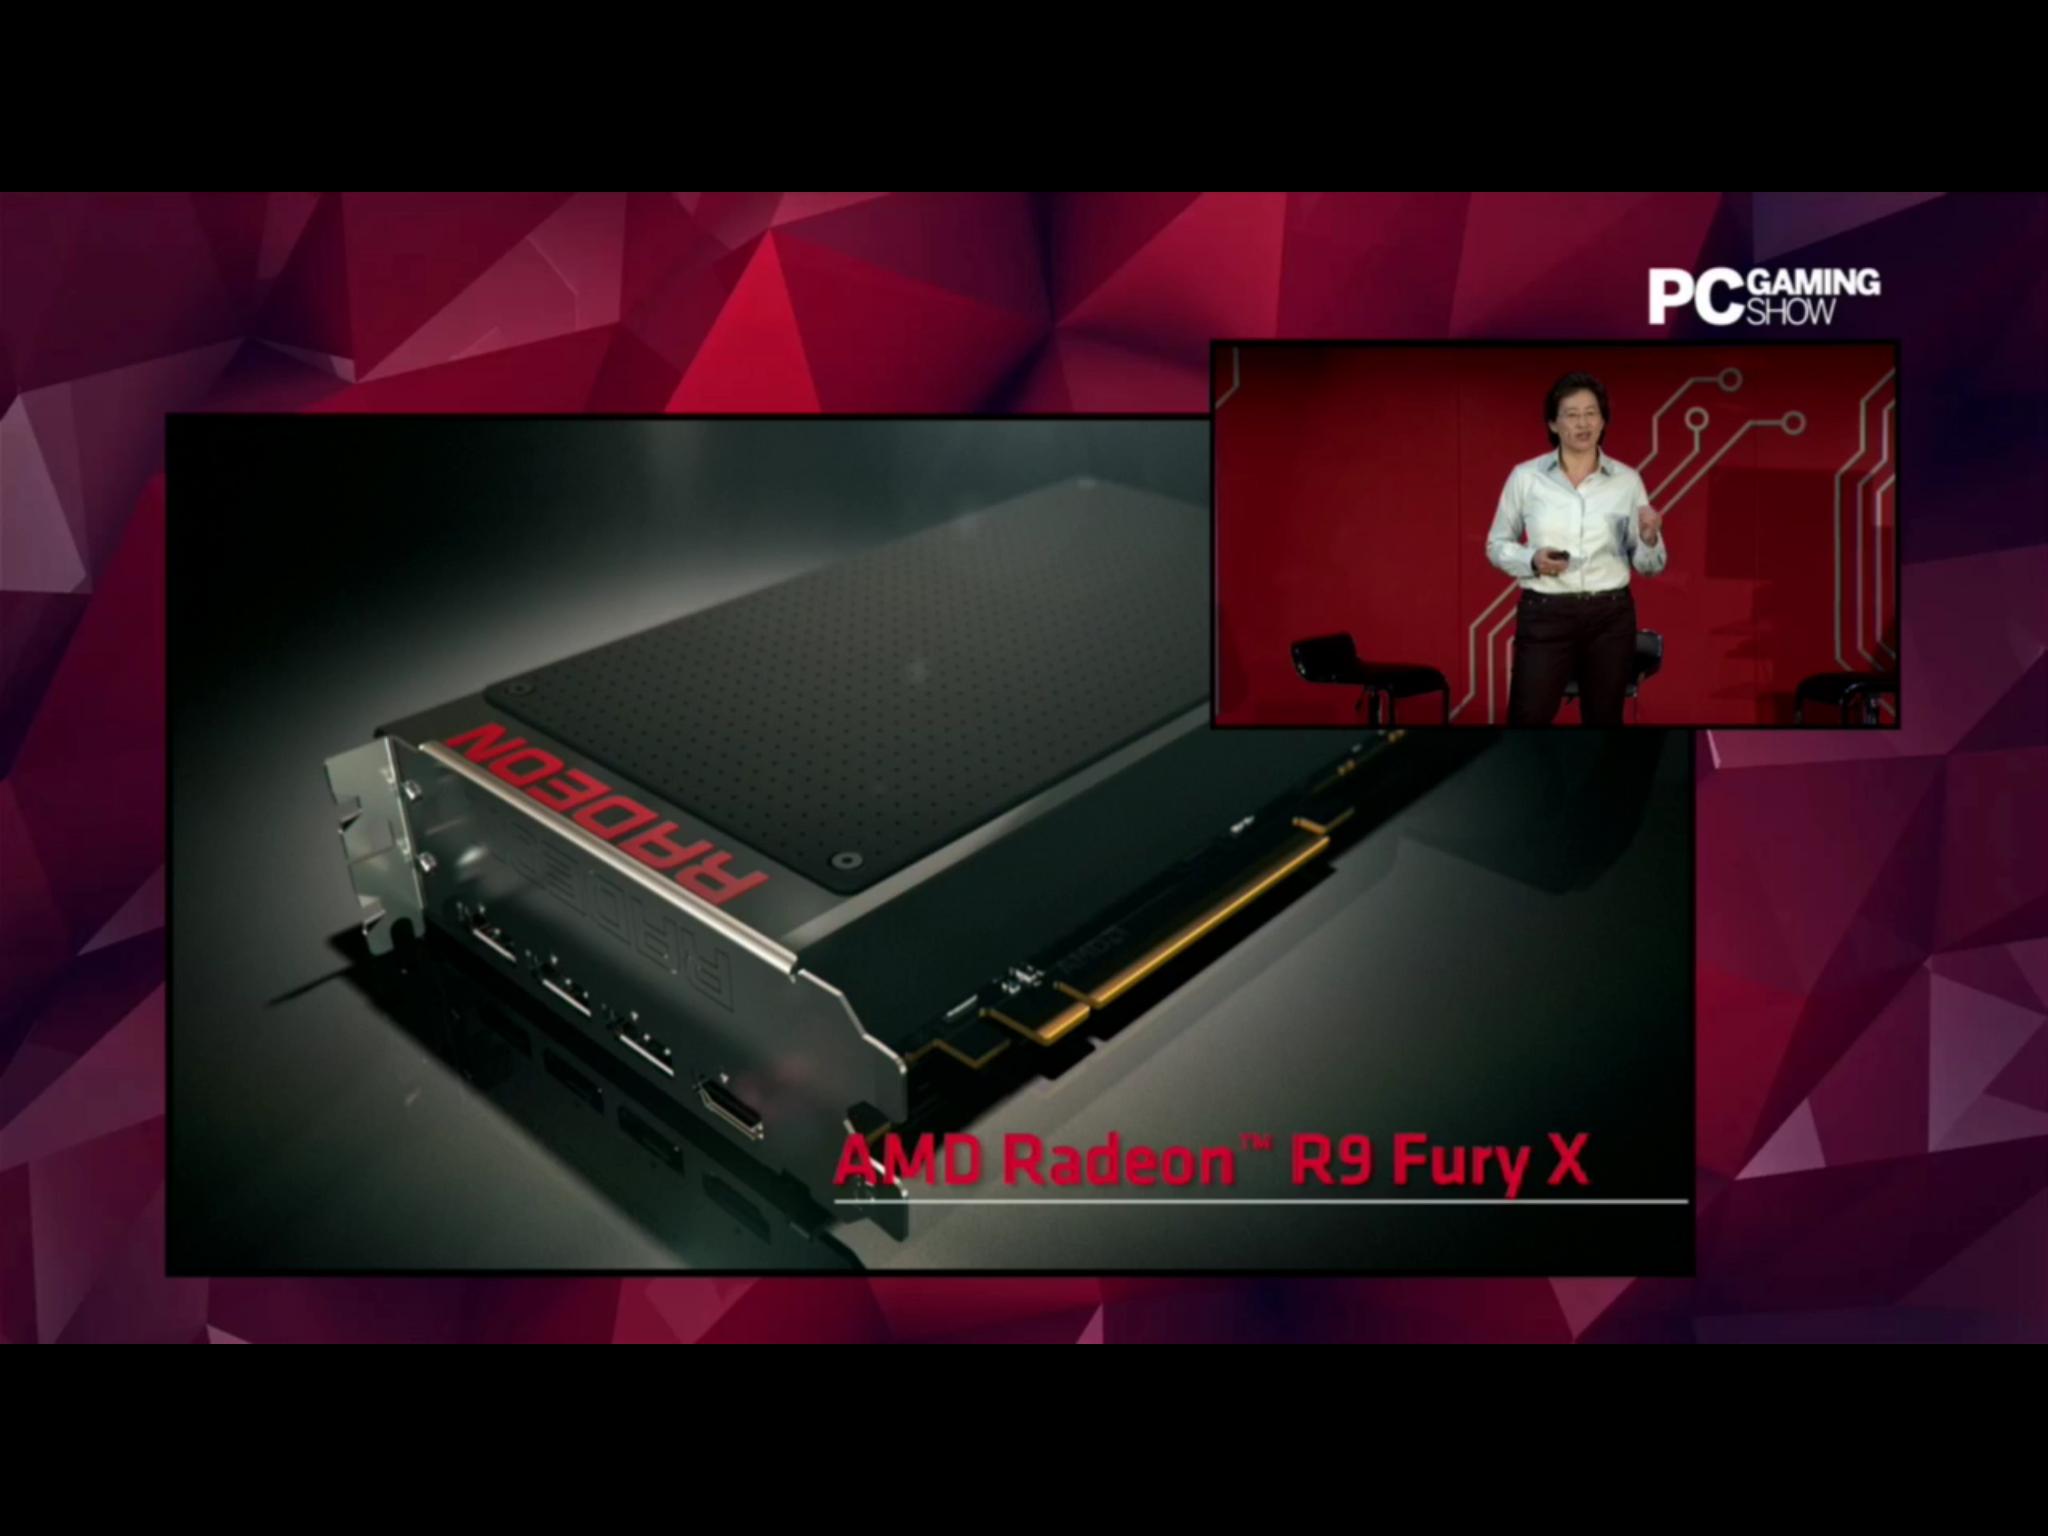 Spécifications de la Radeon R9 Fury X